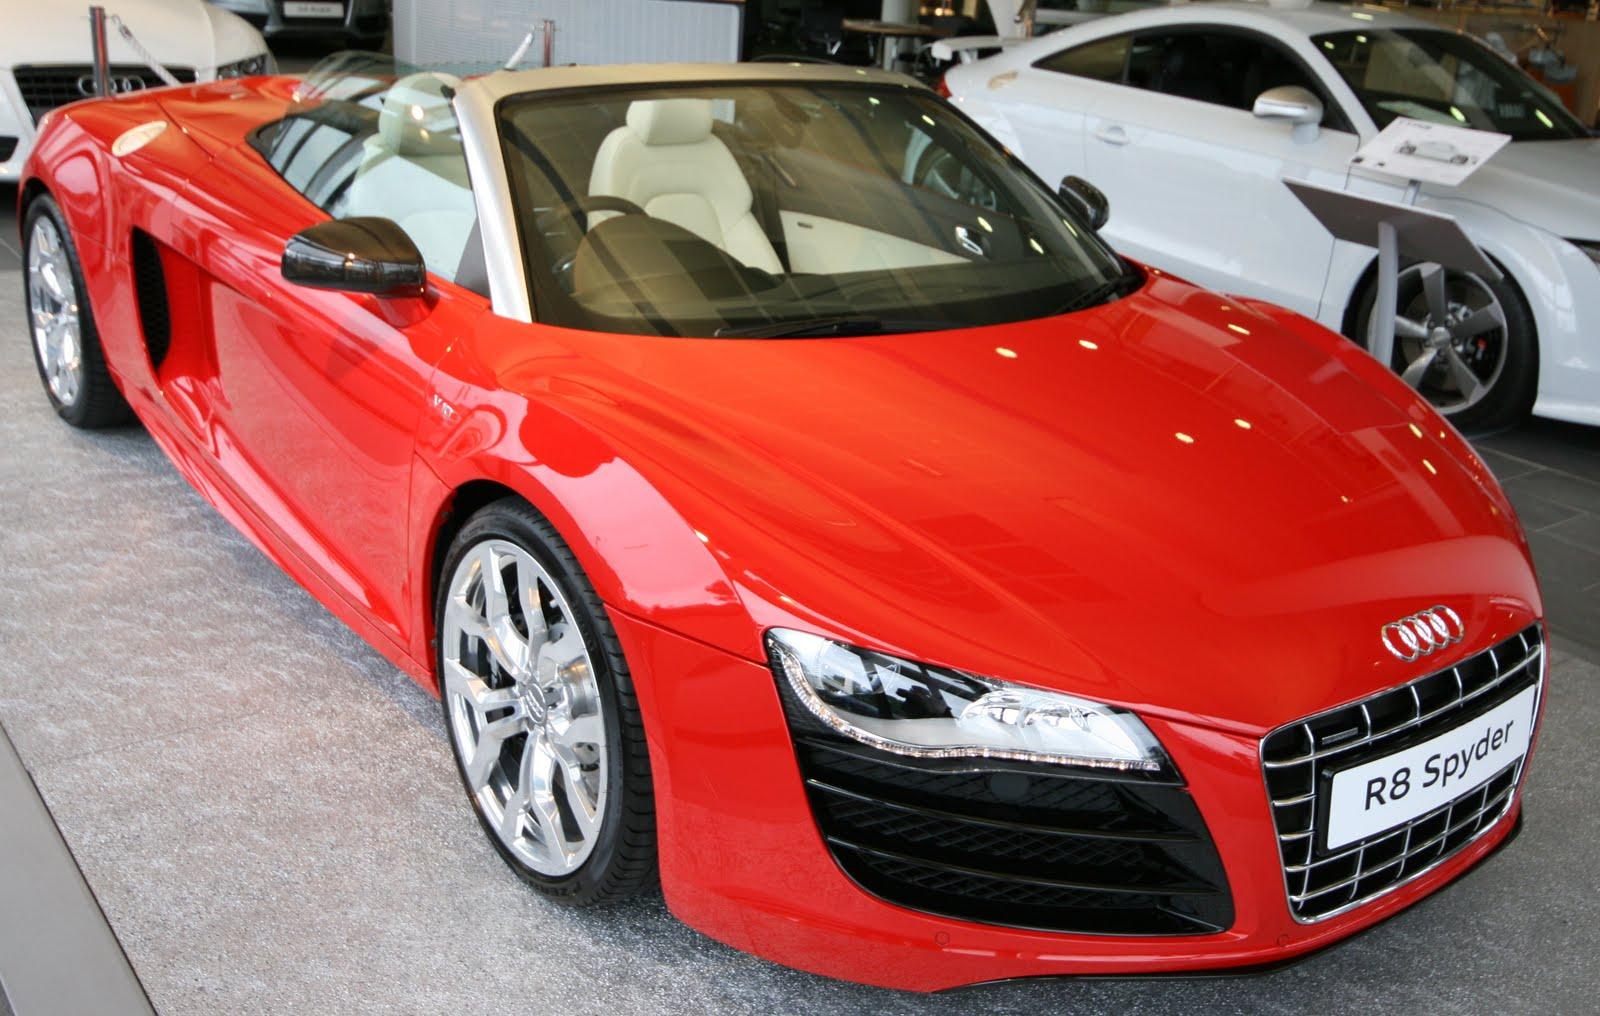 Displaying 11 gt  Images For Audi R8 Red Spyder on Red Audi R8 Spyder